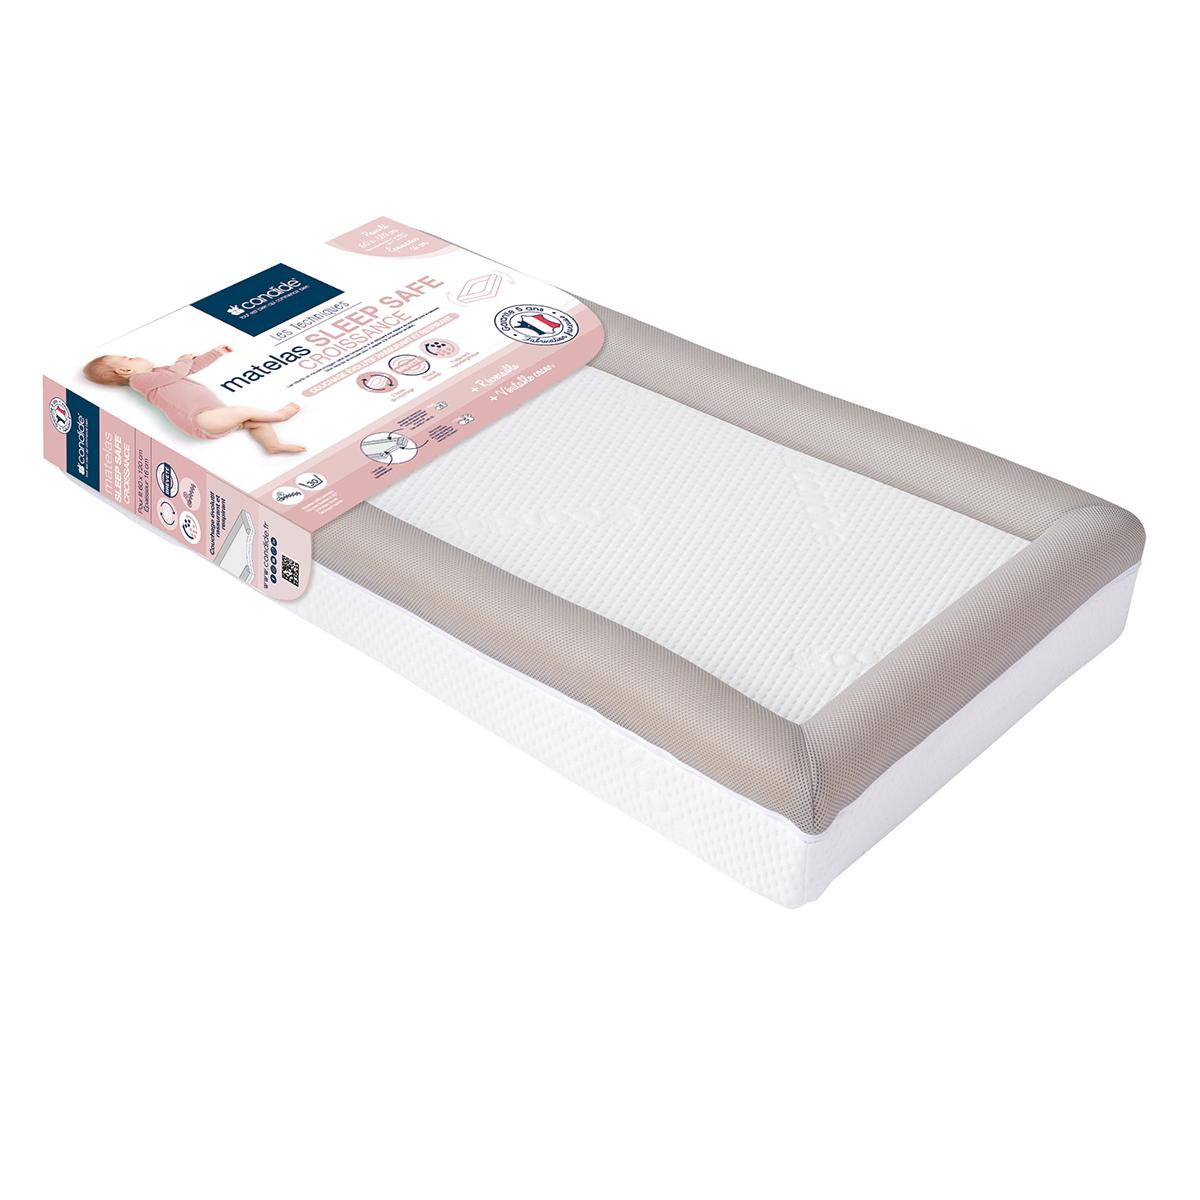 Matelas bébé Matelas Sleep Safe - 60 x 120 cm Matelas Sleep Safe - 60 x 120 cm